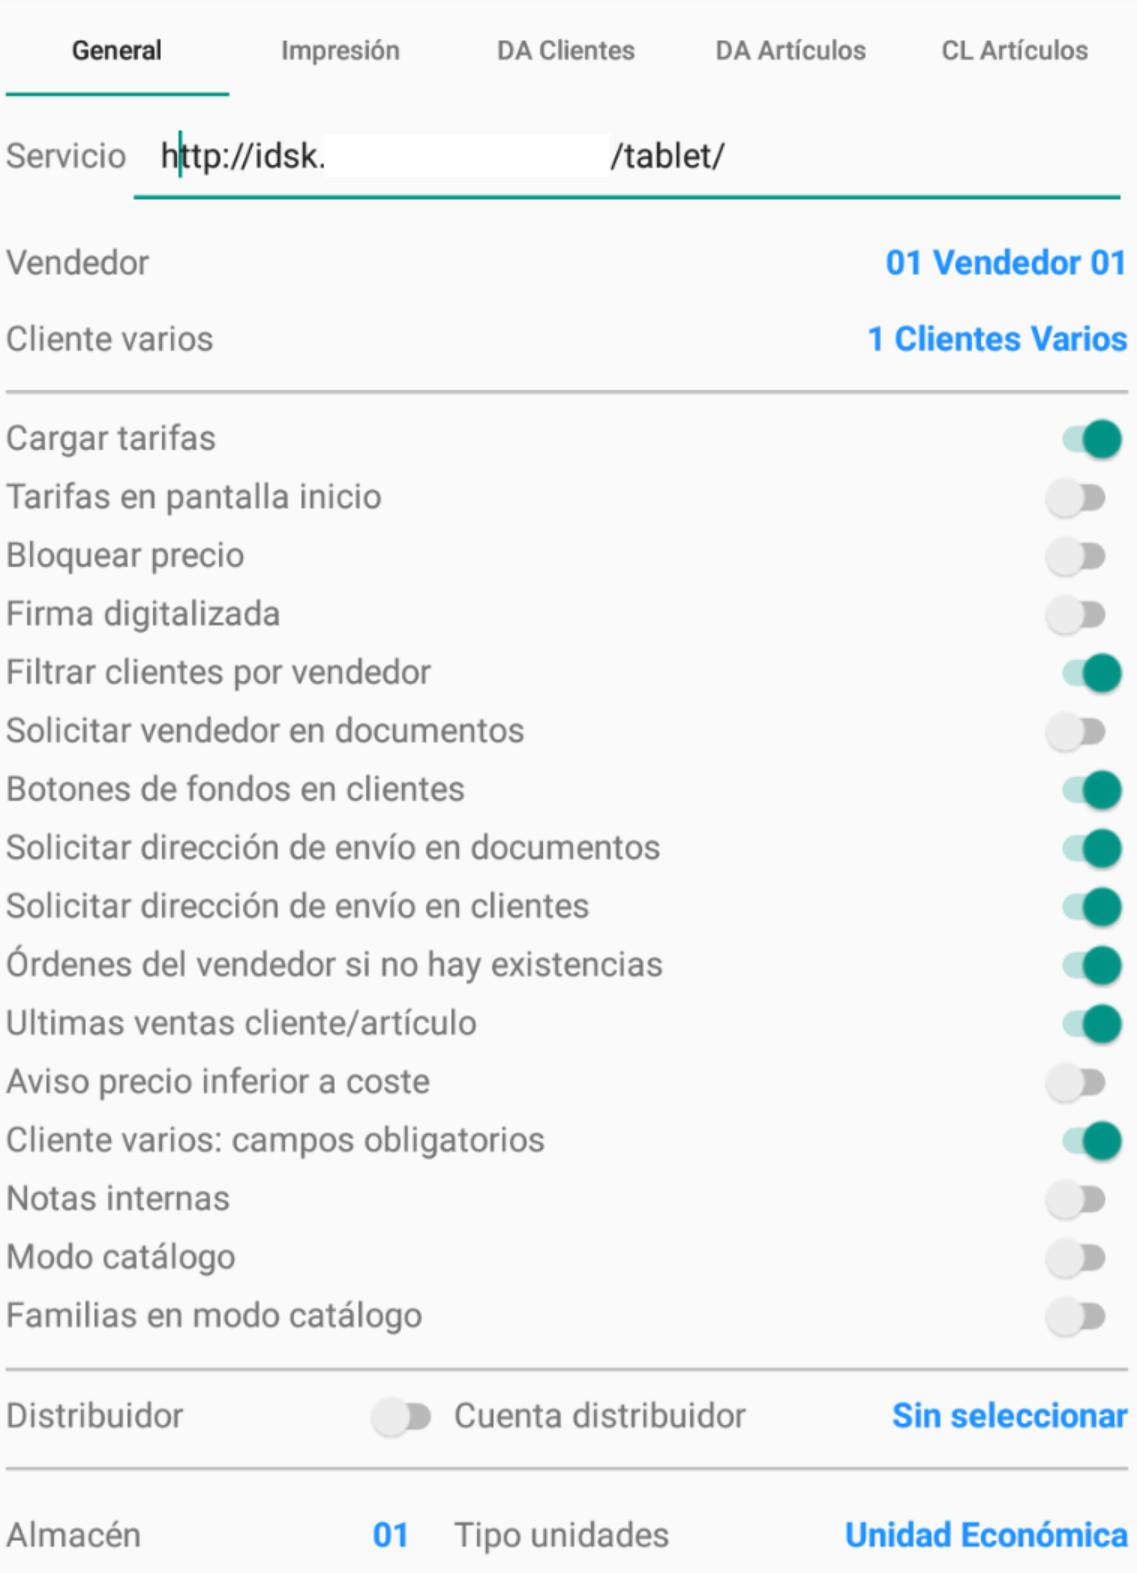 Parámetros DSK Tablet